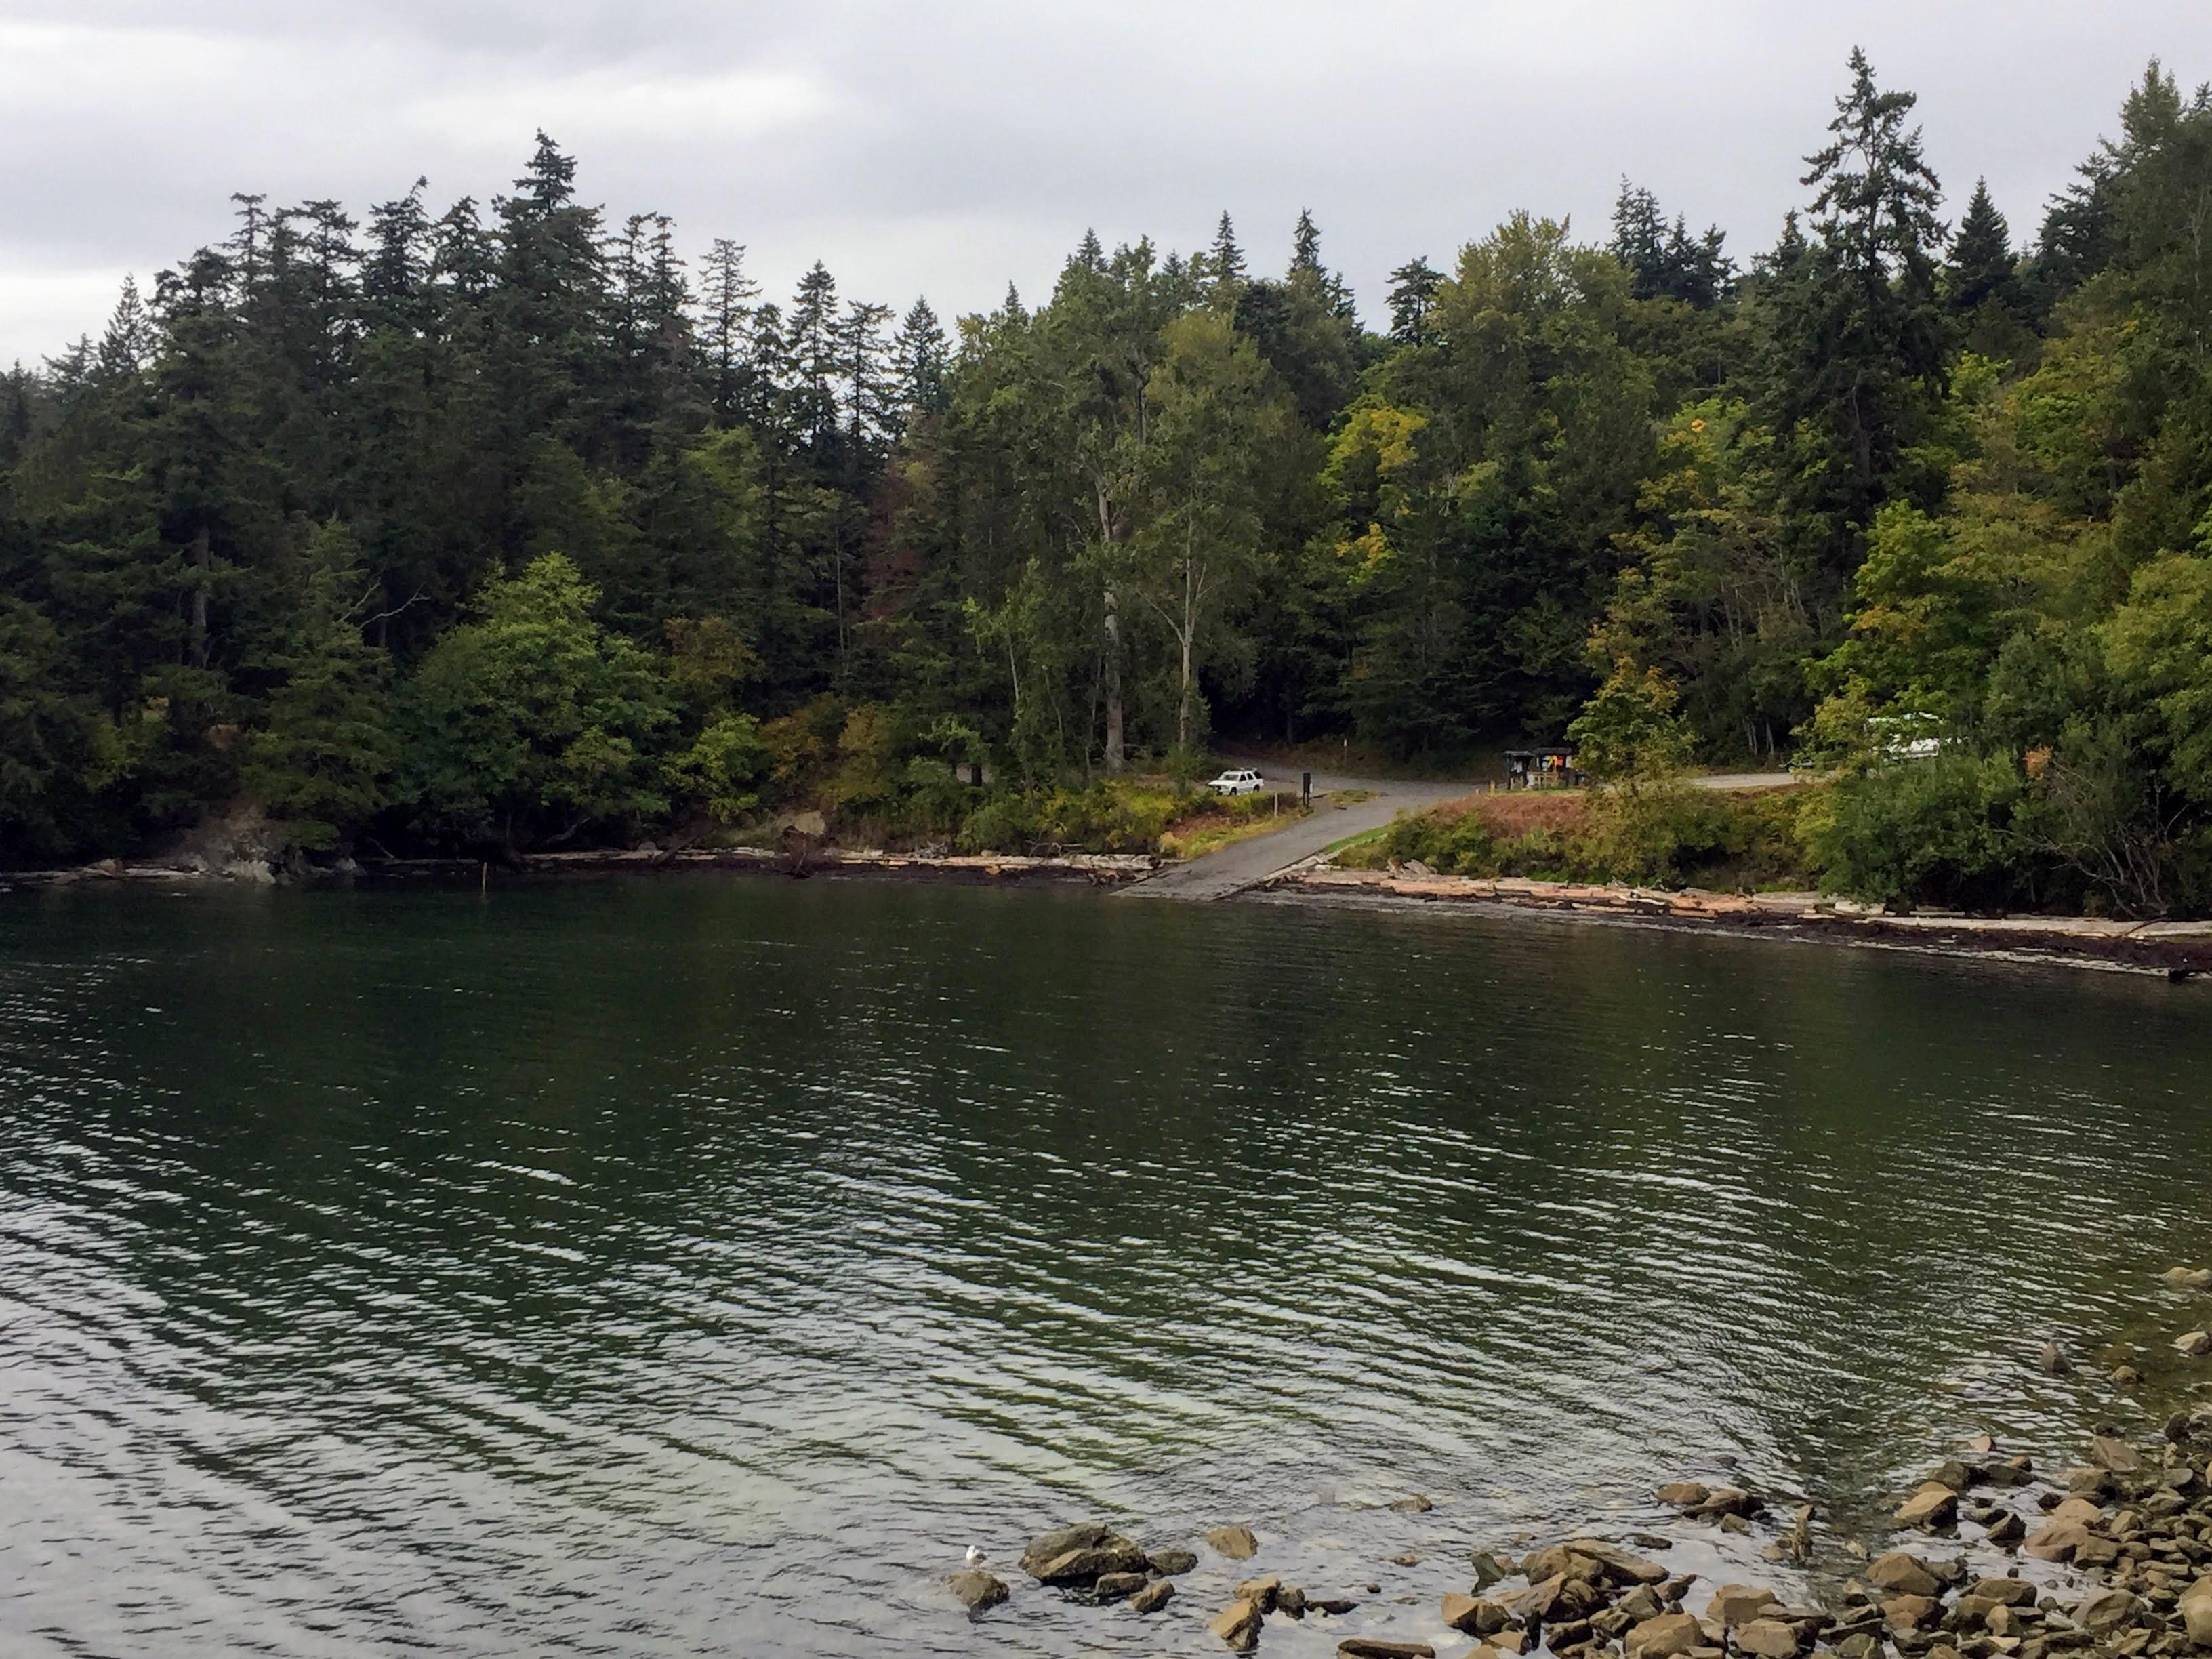 2017-09-25 Washington 01 Larrabee State Park 08